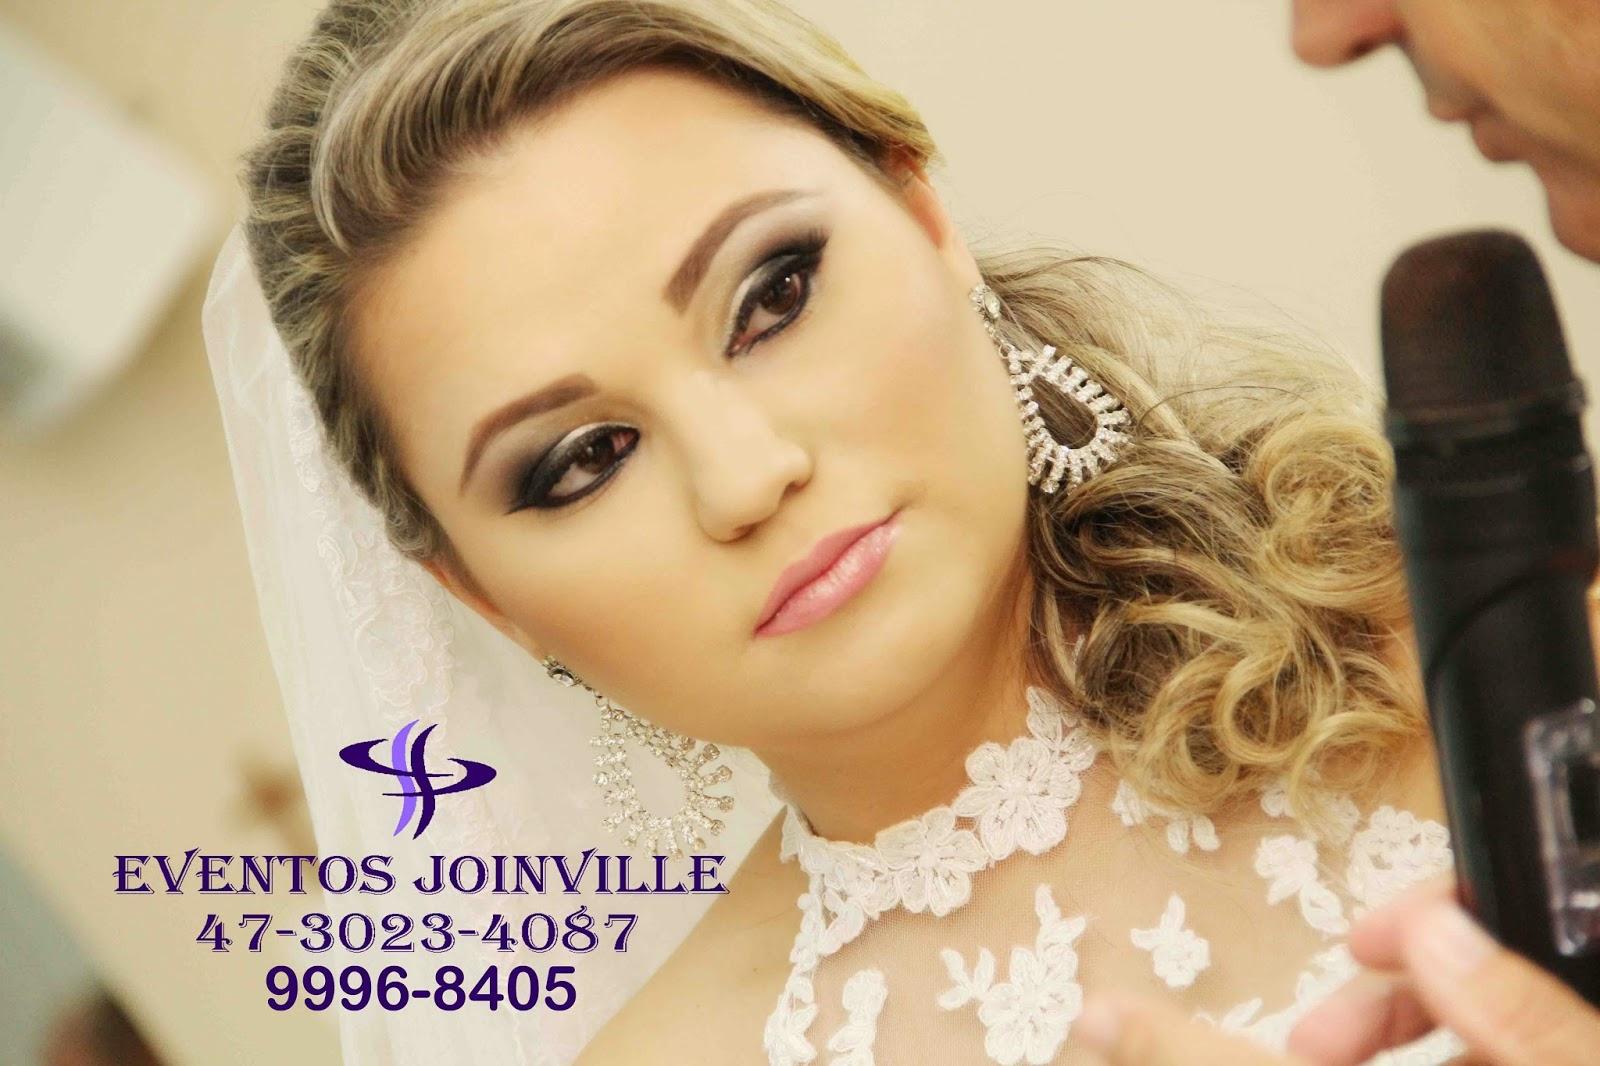 Fotógrafo para casamento em Joinville